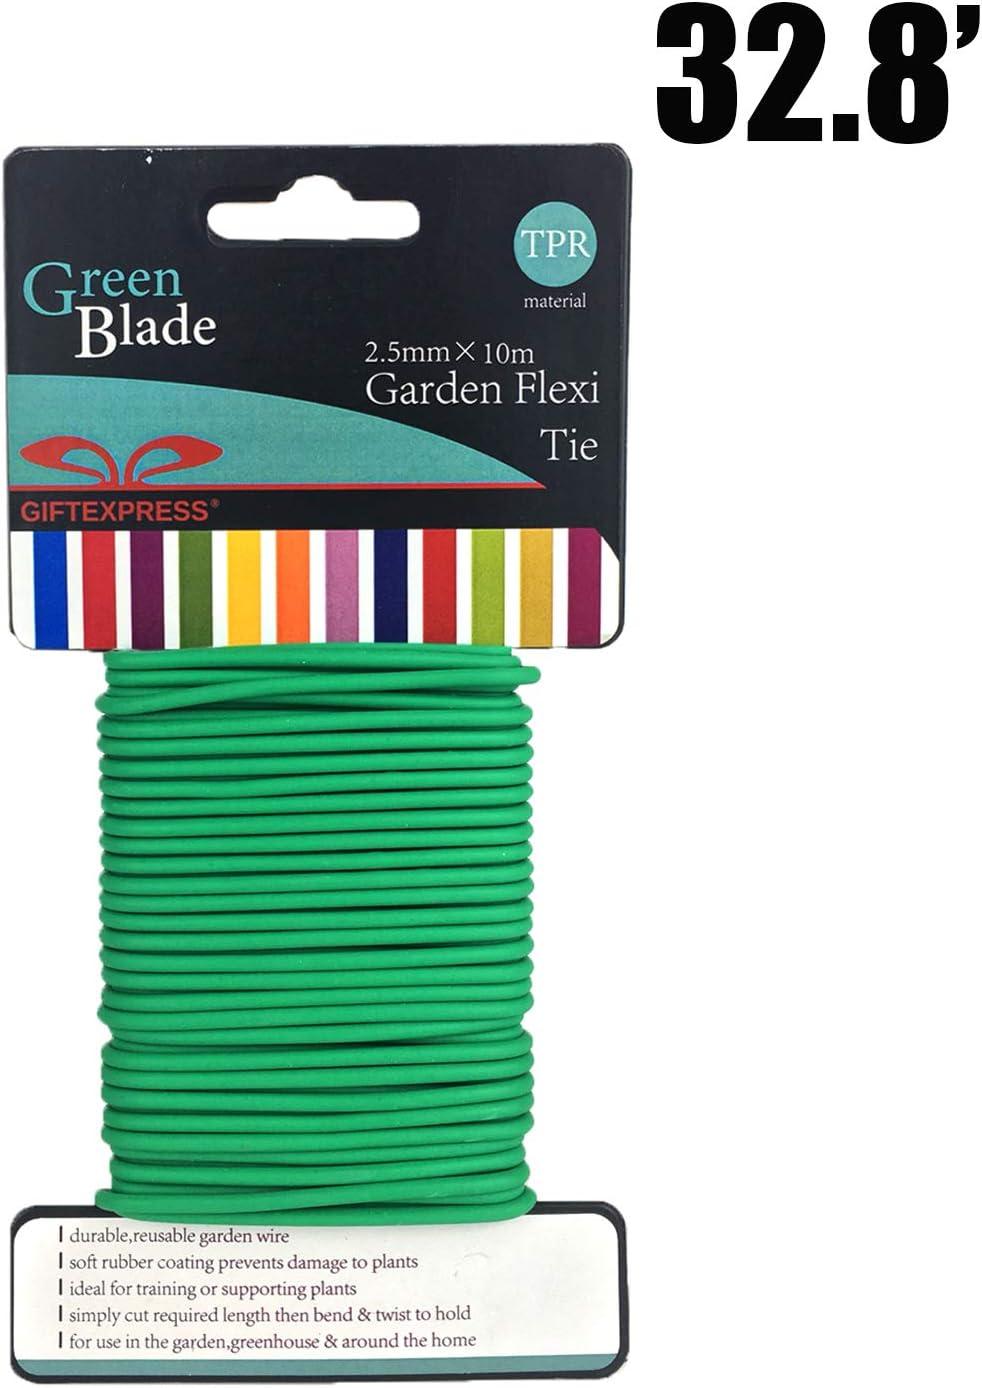 GiftExpress Garden Soft Wire Tie 32.8', Garden Plant Tie, Light Duty Flexi Tie, Plant Twist Ties